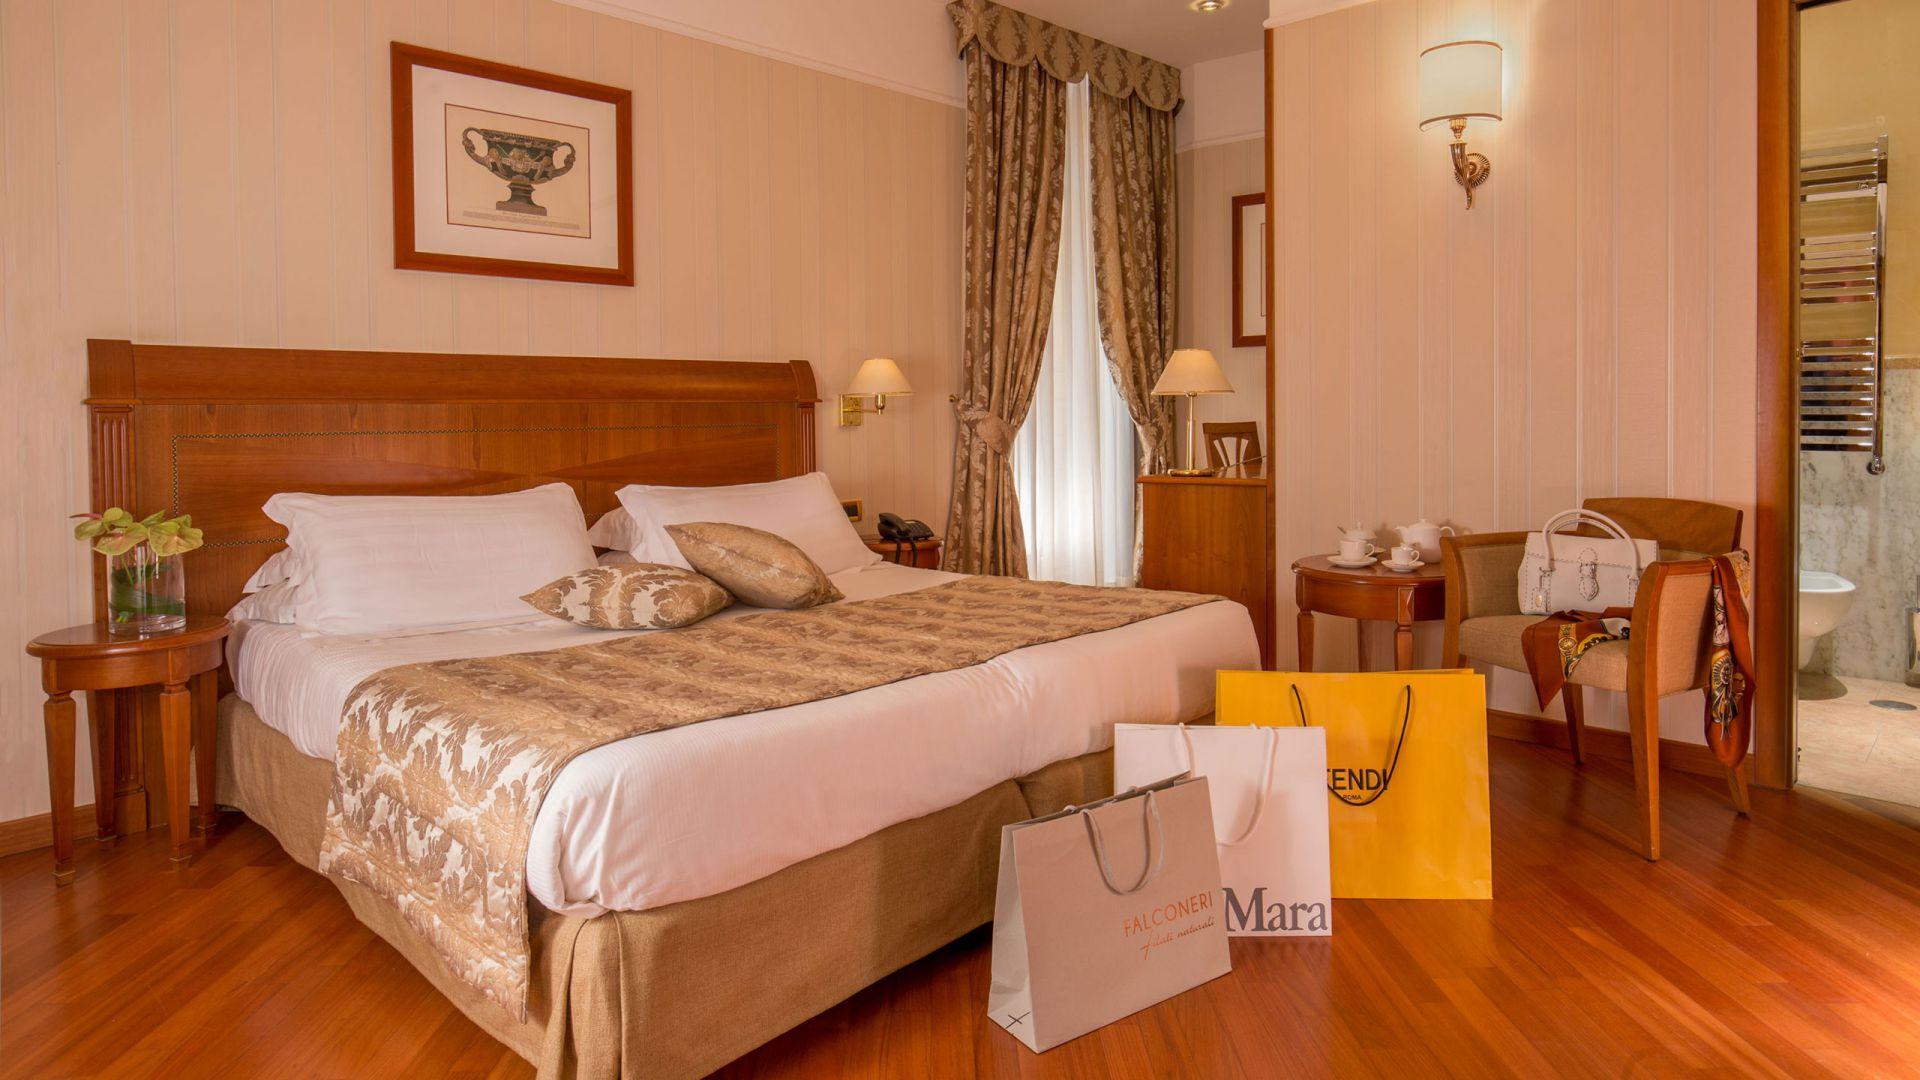 albergo-ottocento-rome-double-room-deluxe-05